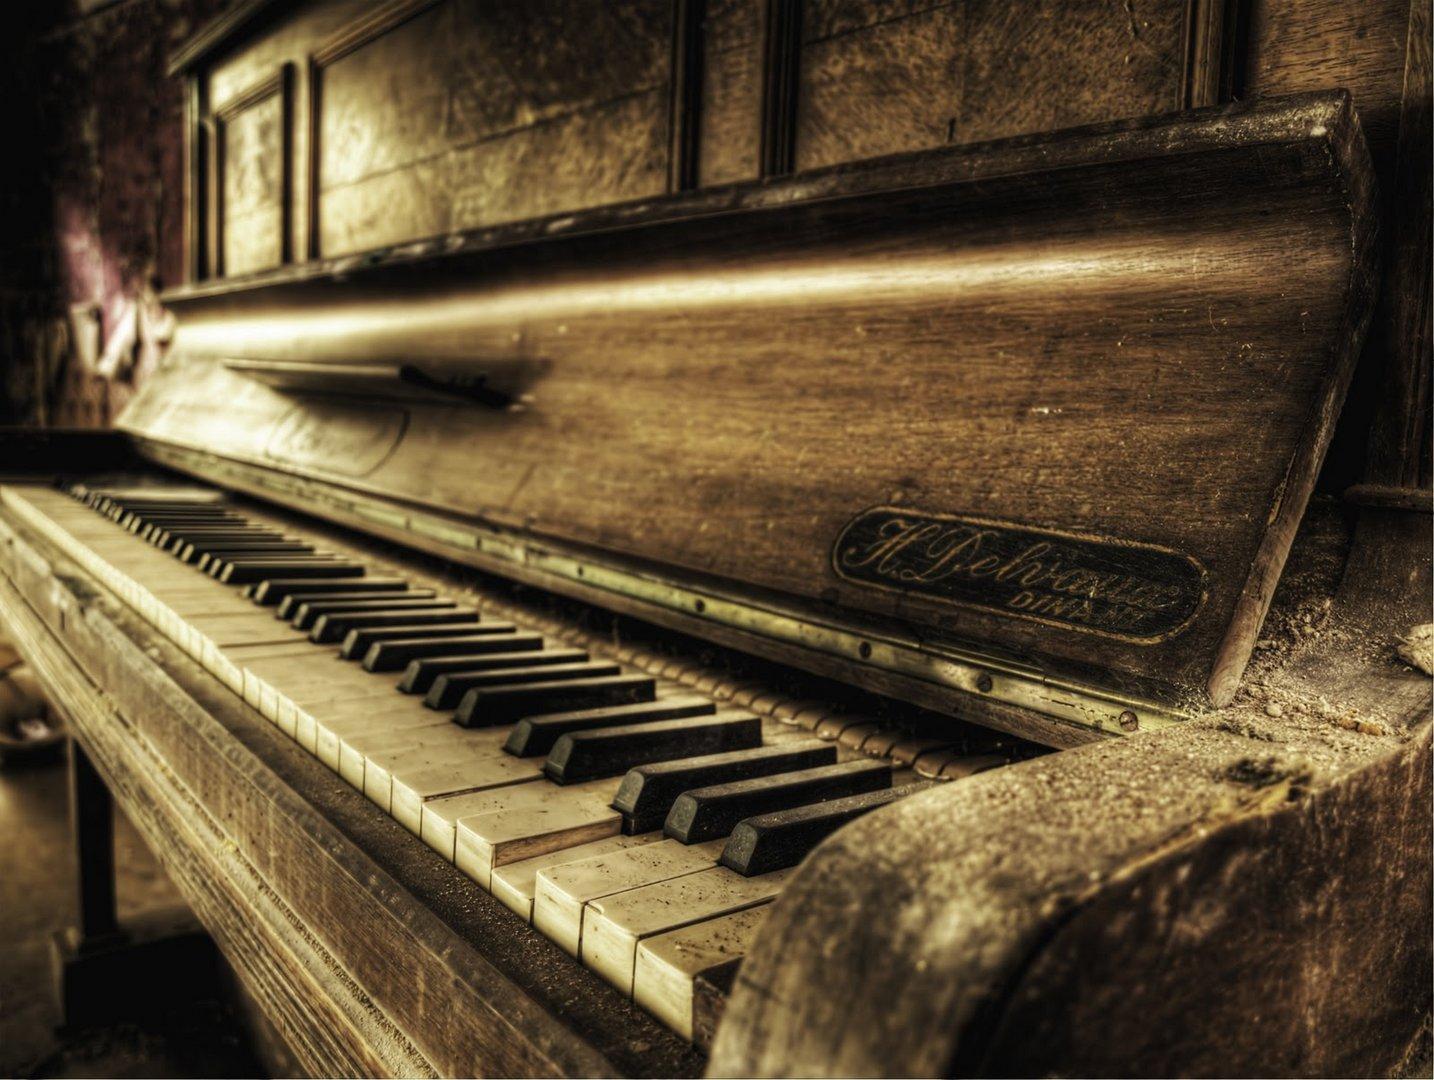 No more Mozart